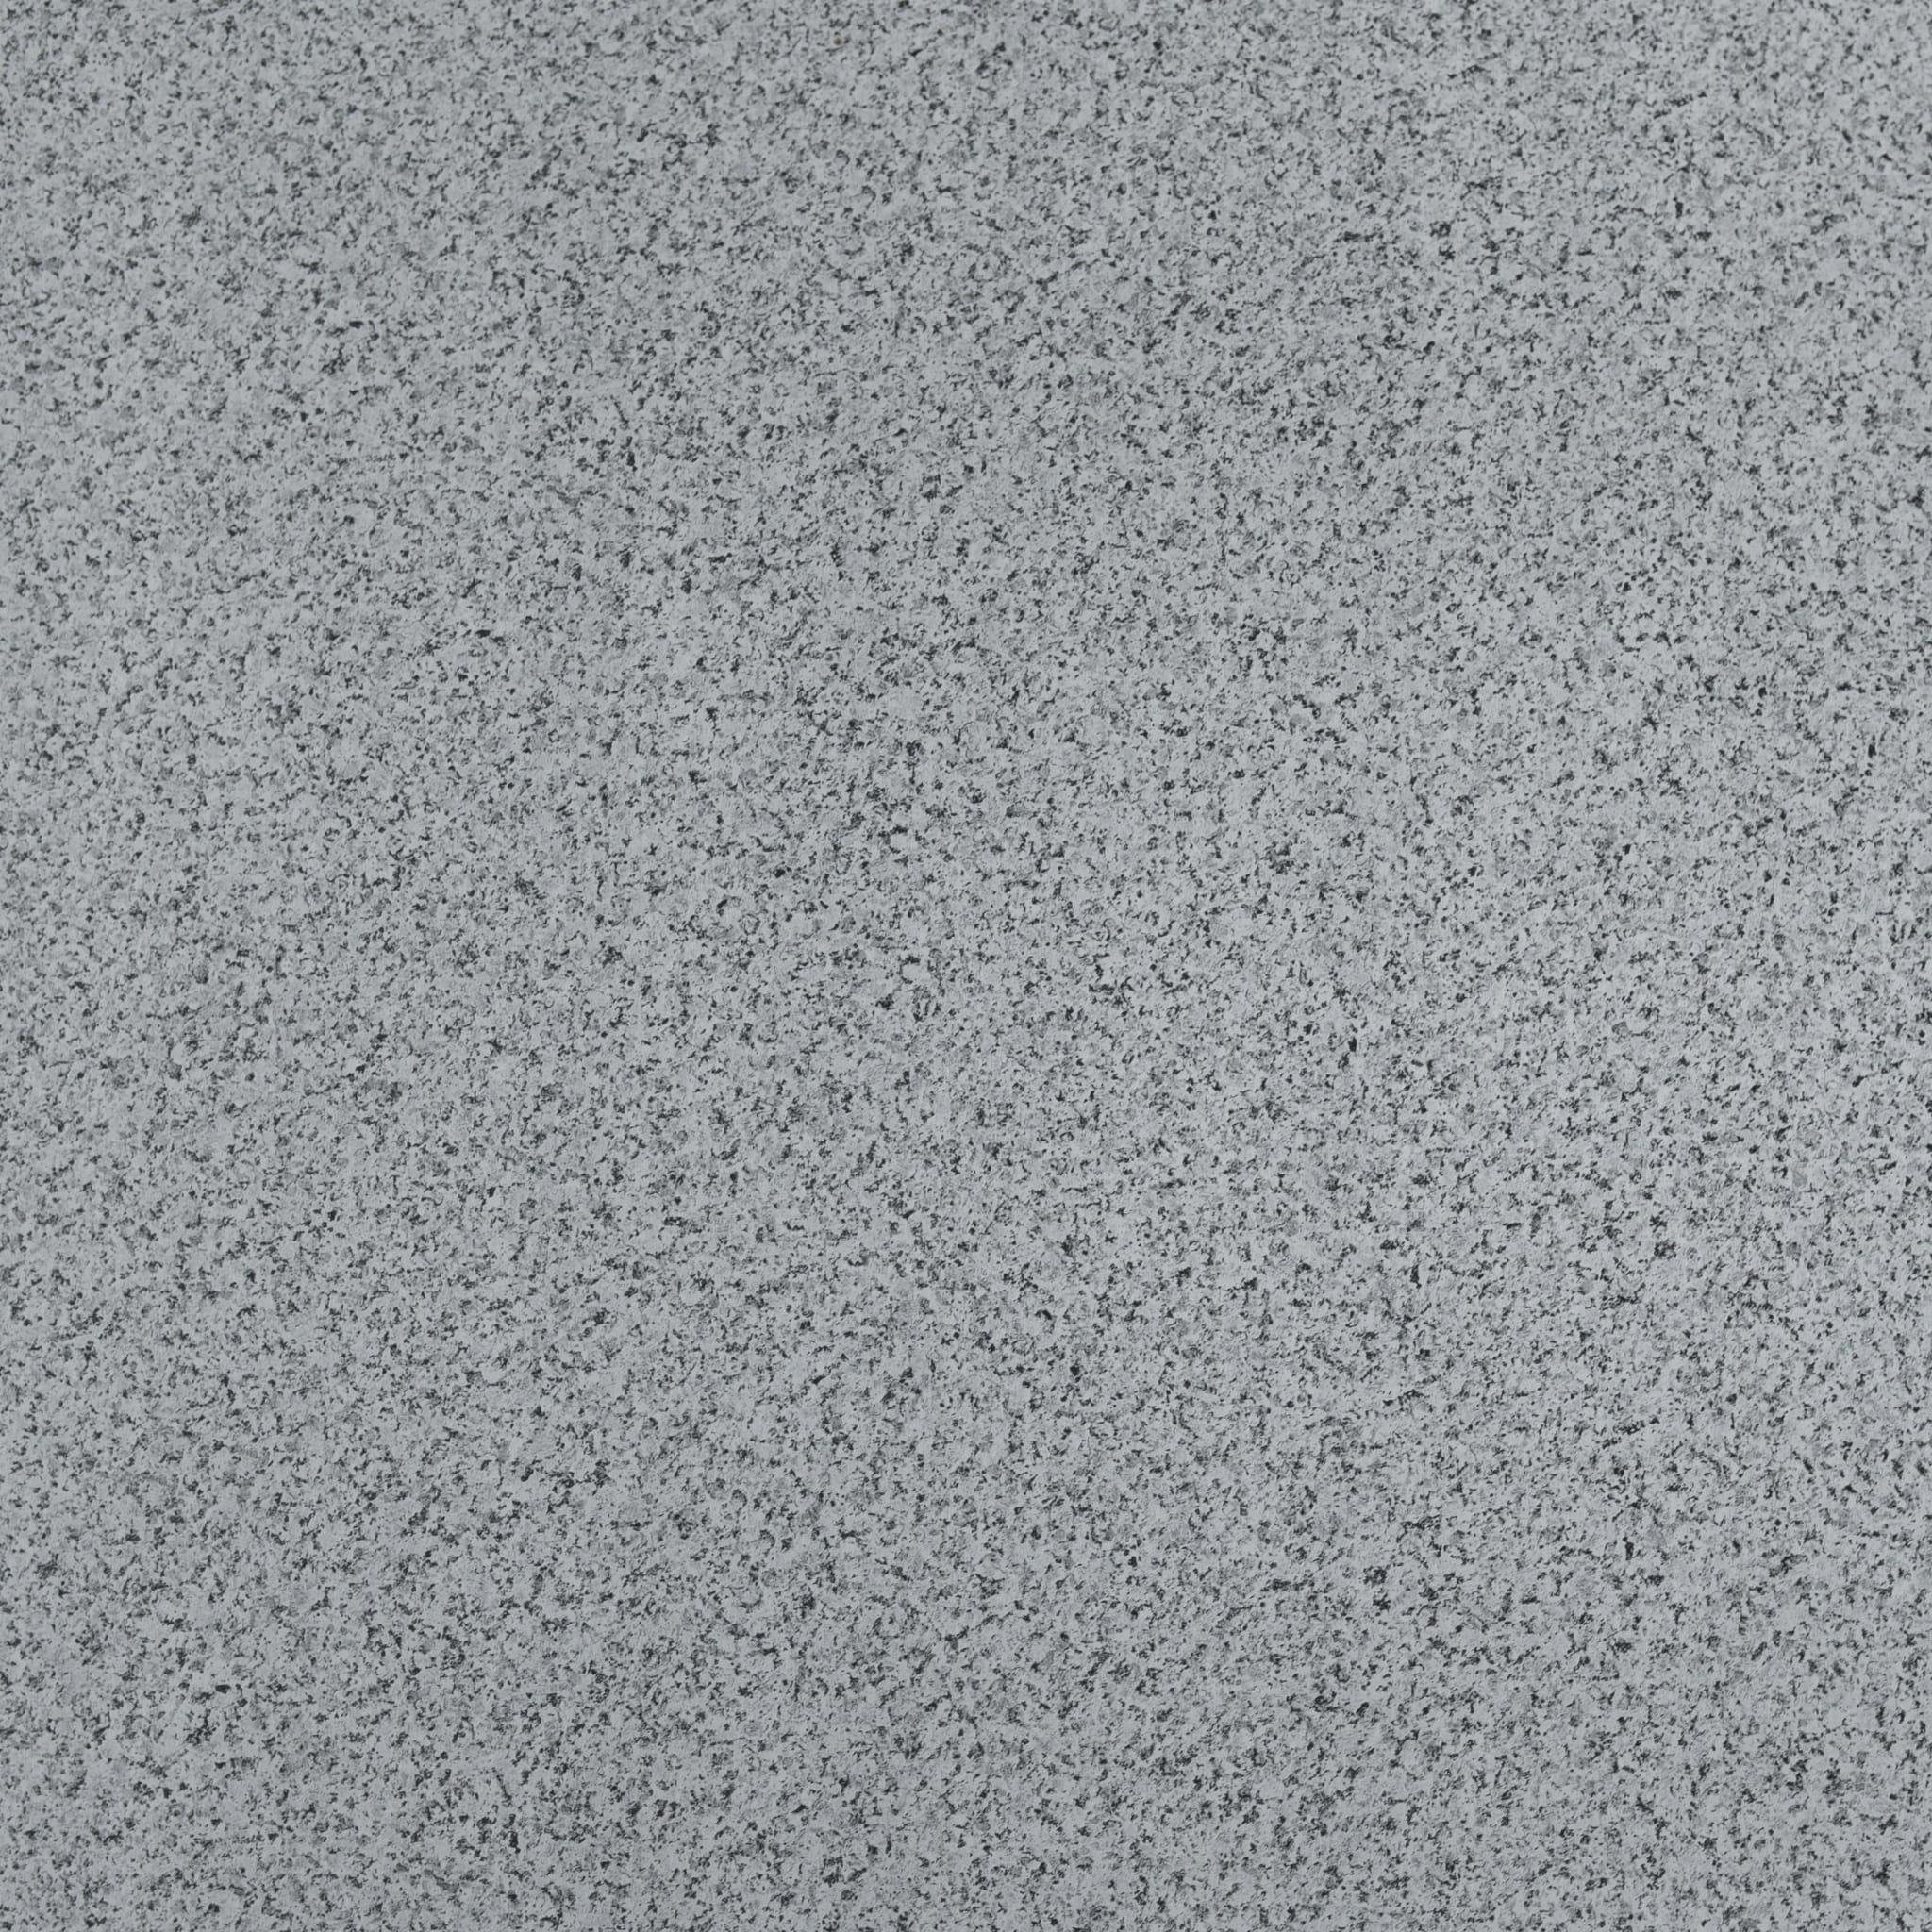 Wykładzina PCV linoleum gumolit lastryko szara 2m